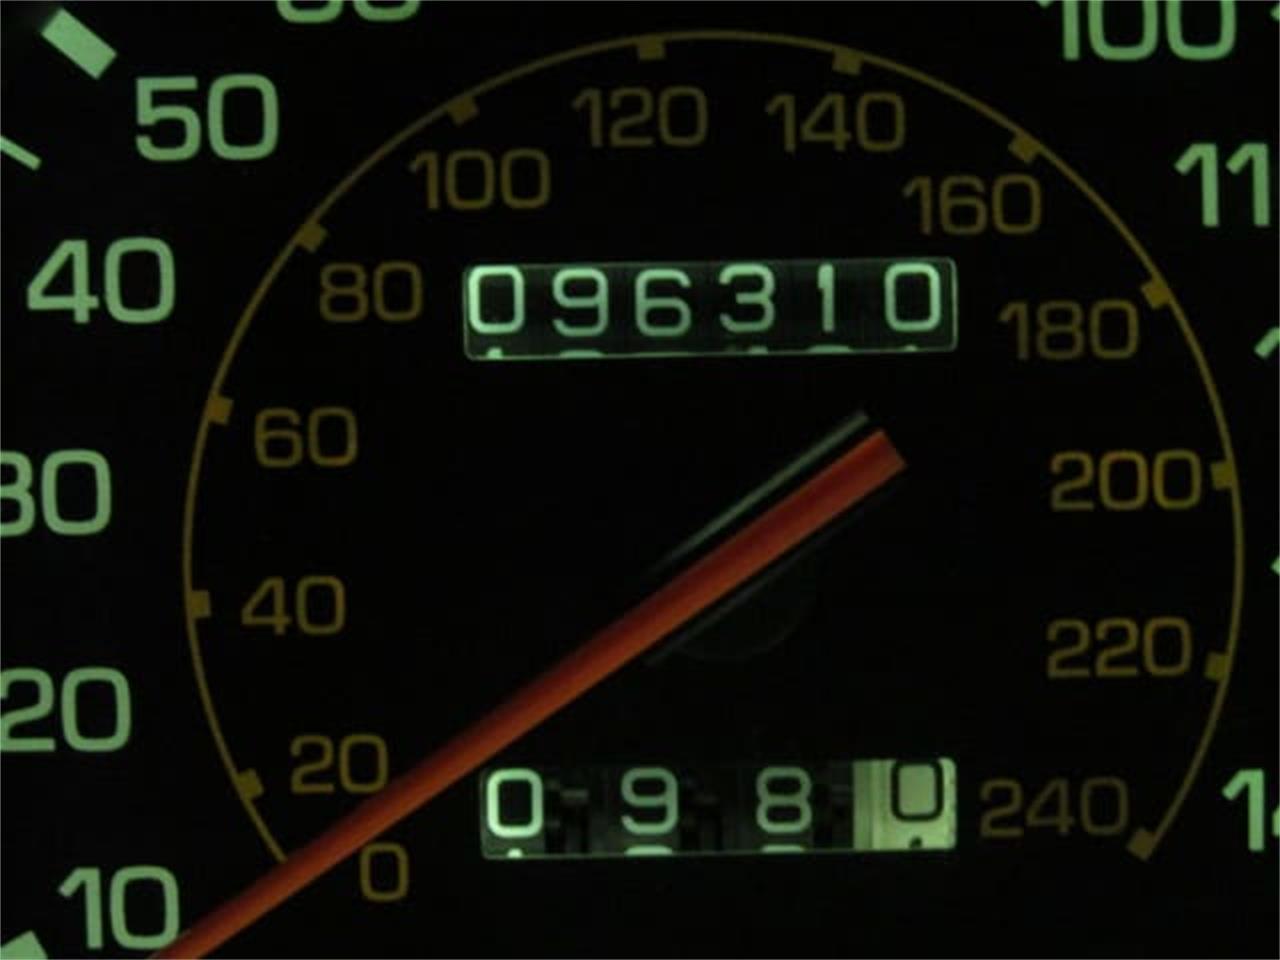 Large Picture of 1990 Celica located in Christiansburg Virginia - $7,918.00 - LI31